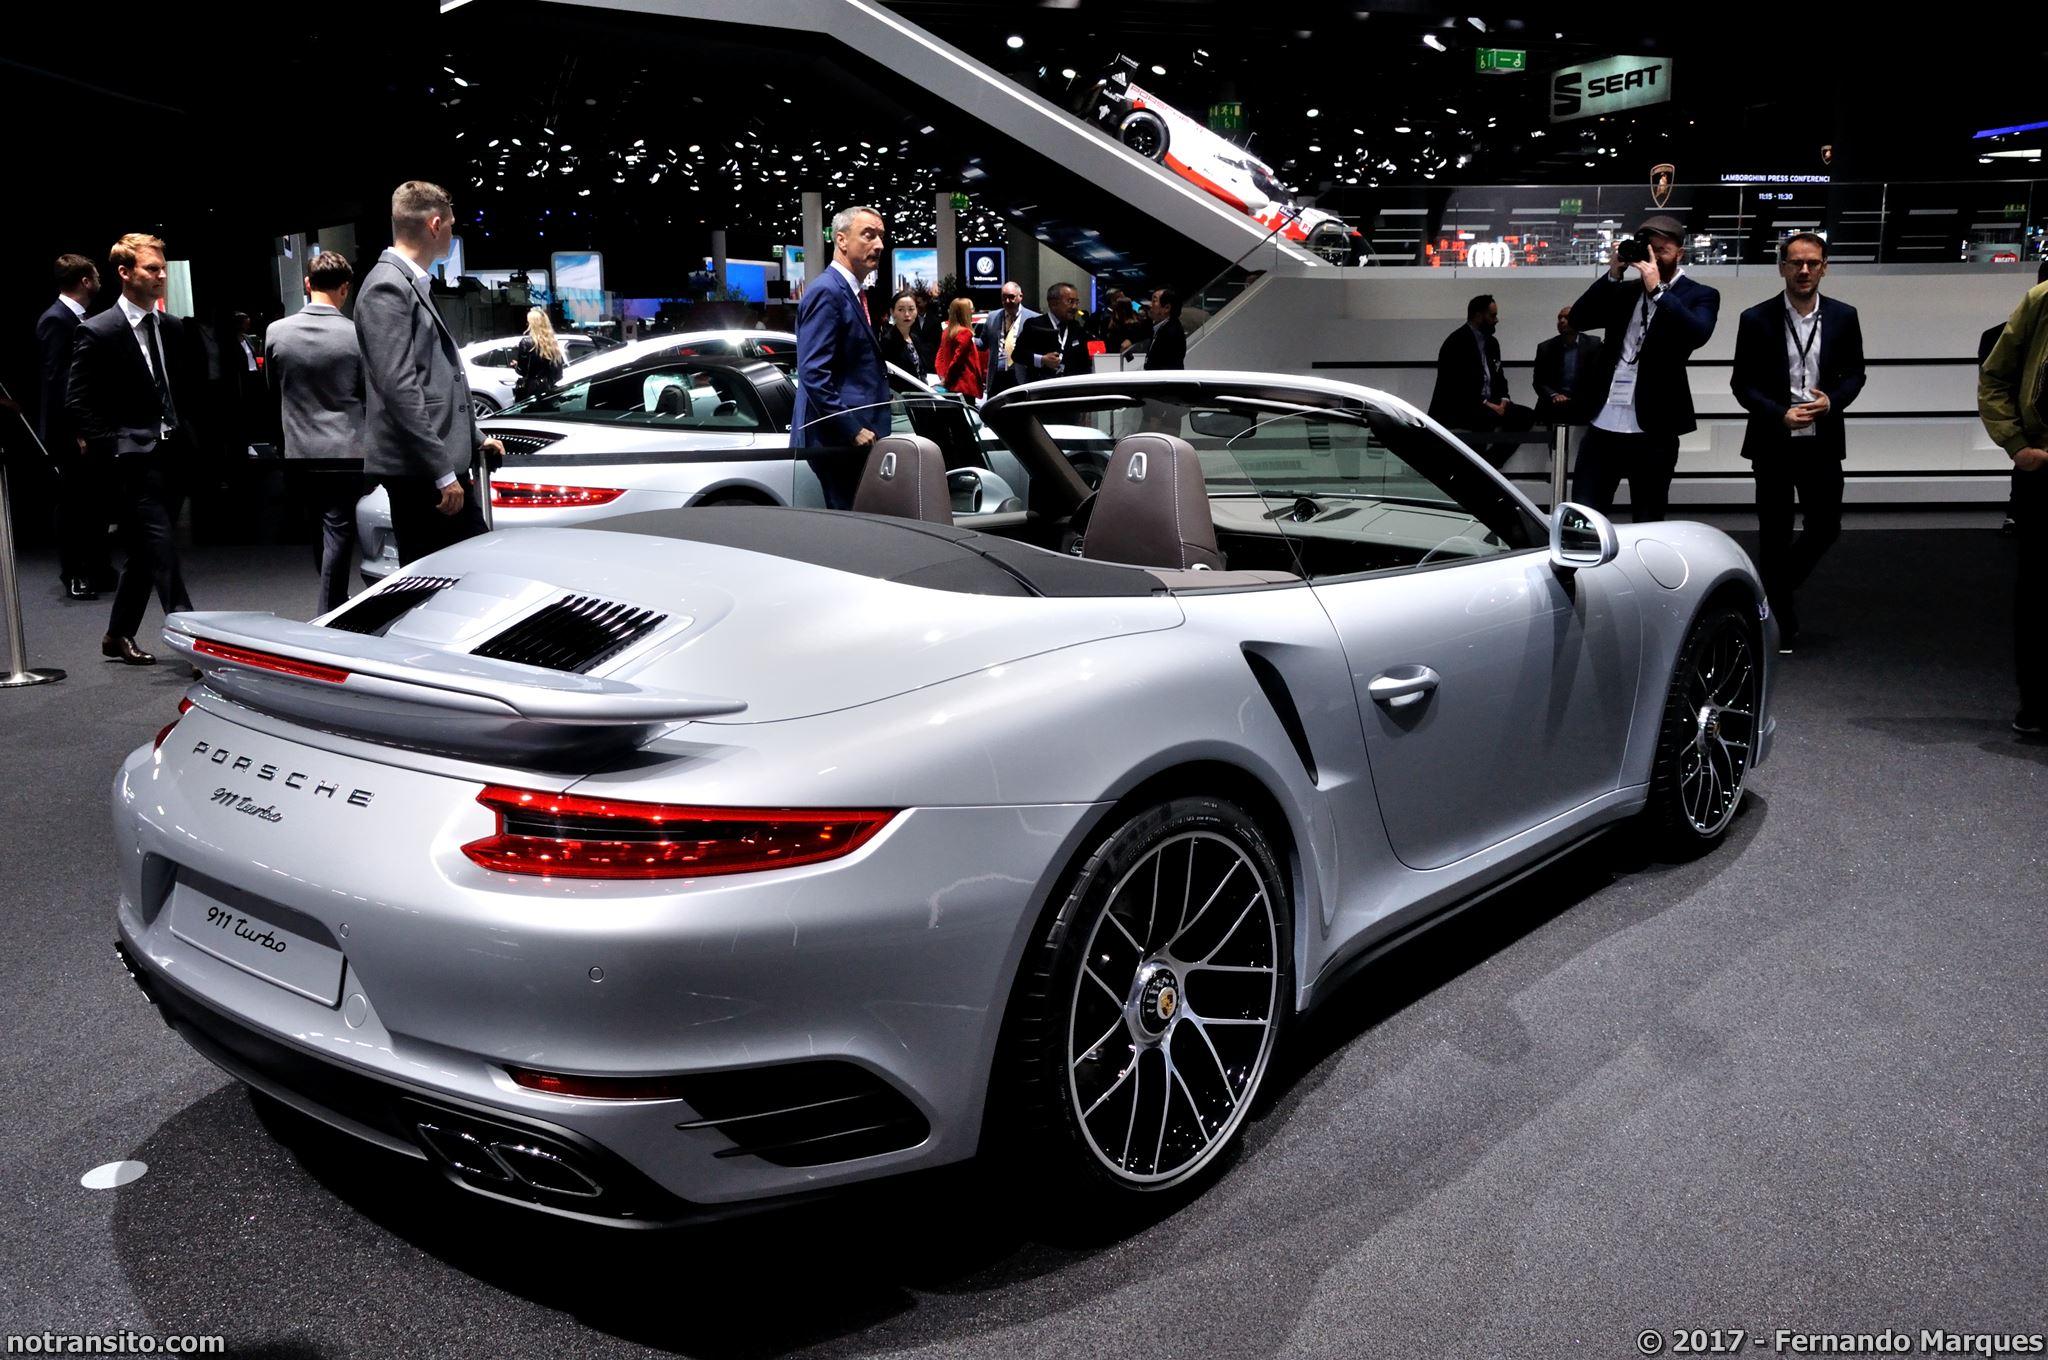 Porsche-911-Turbo-S-Cabriolet-Frankfurt-2017-004